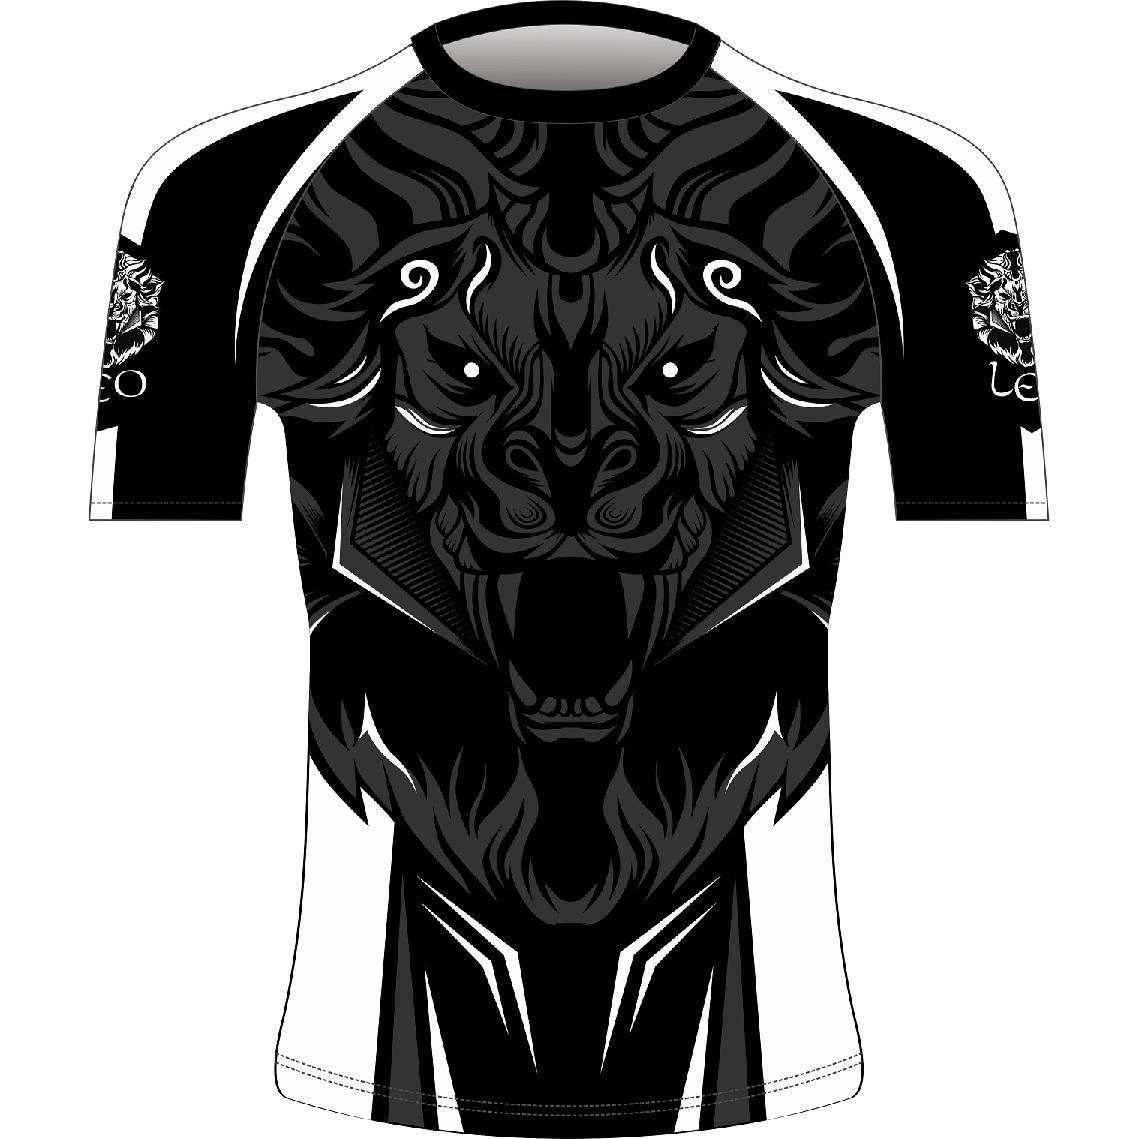 Leo ROAR Rashguard SS - Black/White